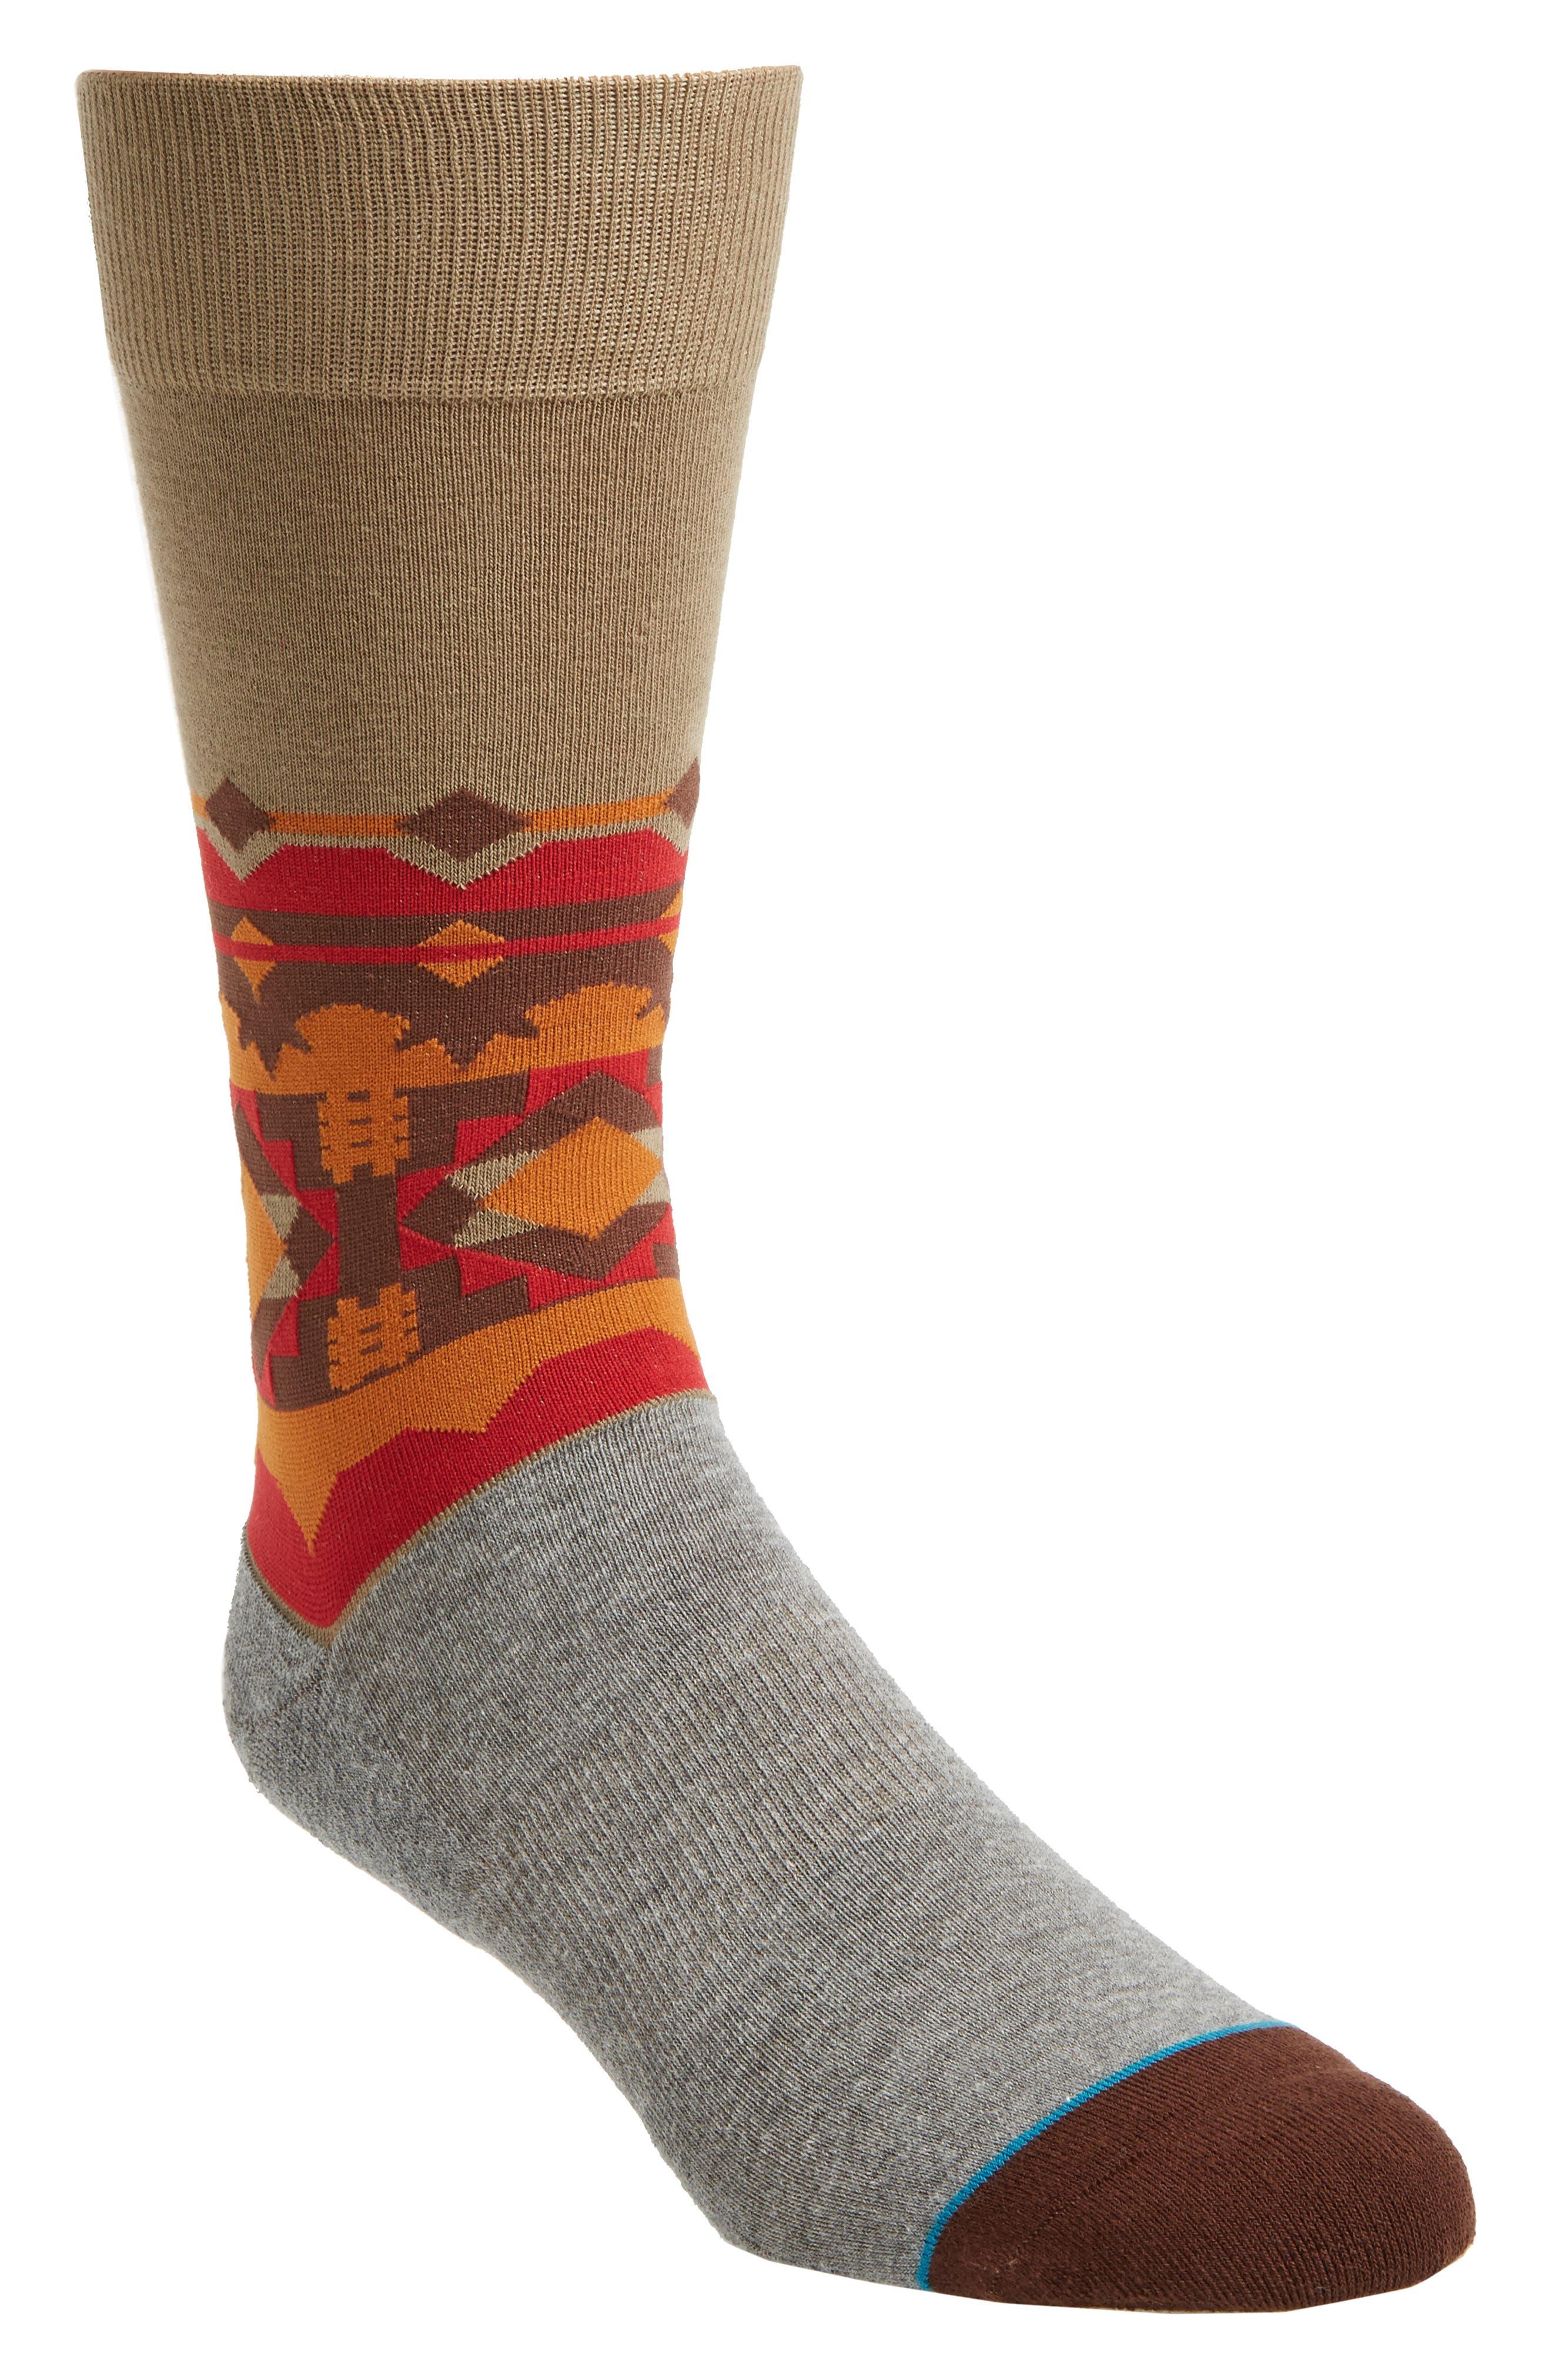 Sinaloa Socks,                             Main thumbnail 1, color,                             Red/ Olive